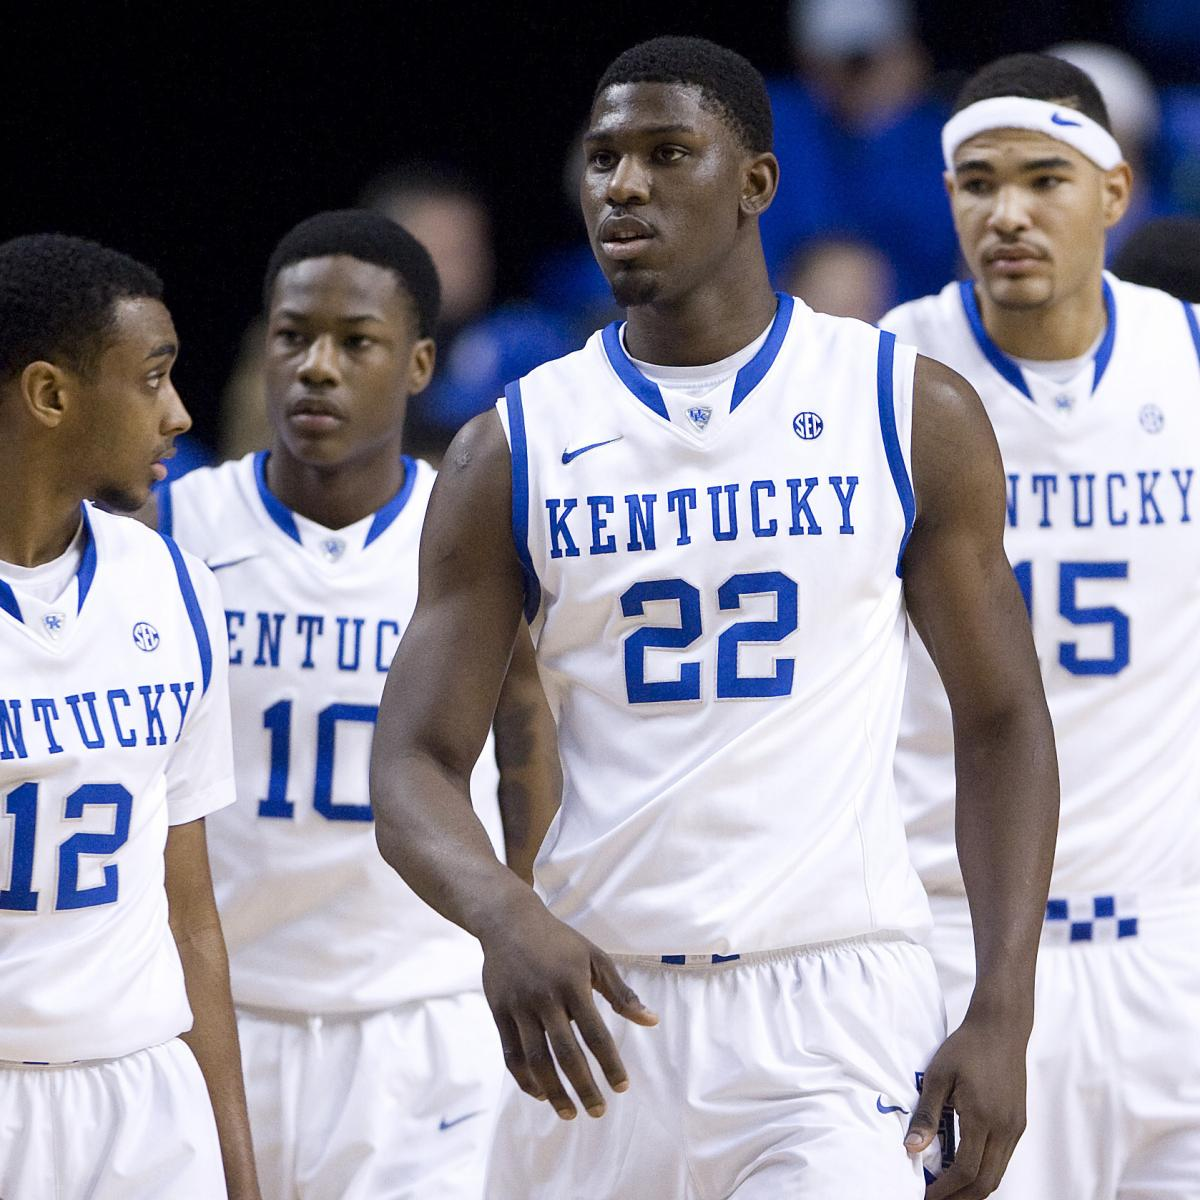 online retailer 92153 0cbd2 Kentucky Wildcats Basketball: Alex Poythress Is the Key to ...